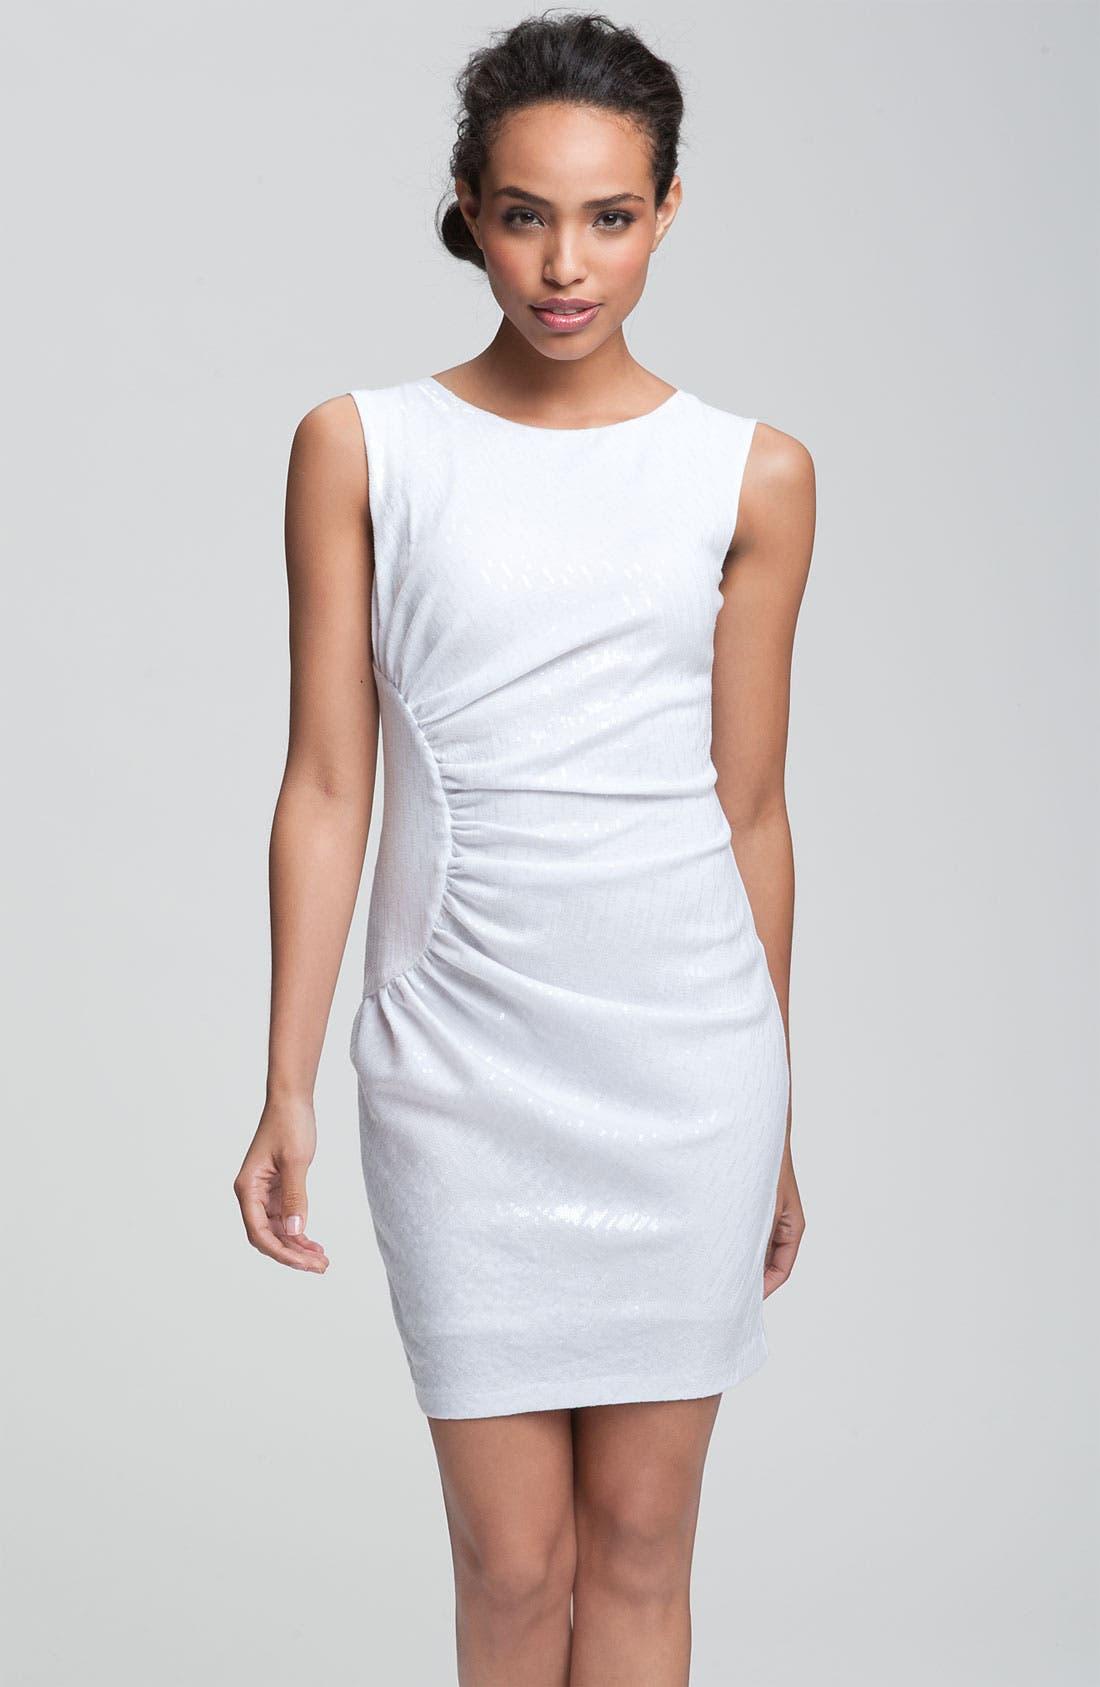 Main Image - Alexia Admor Sequined Jersey Knit Sheath Dress